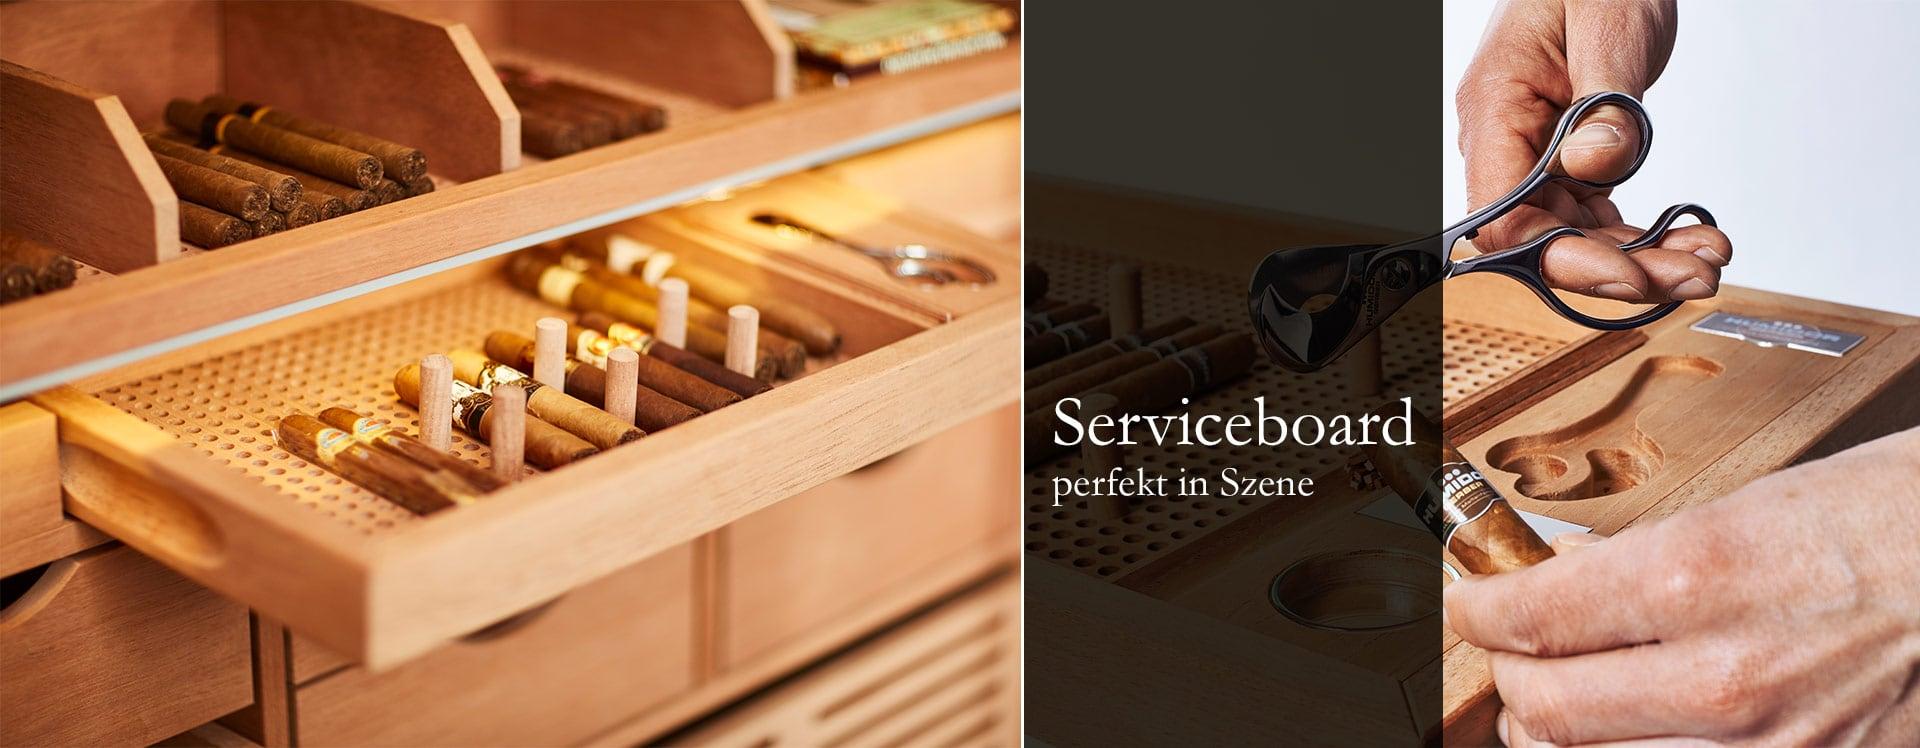 GERBER Humidor Serviceboard